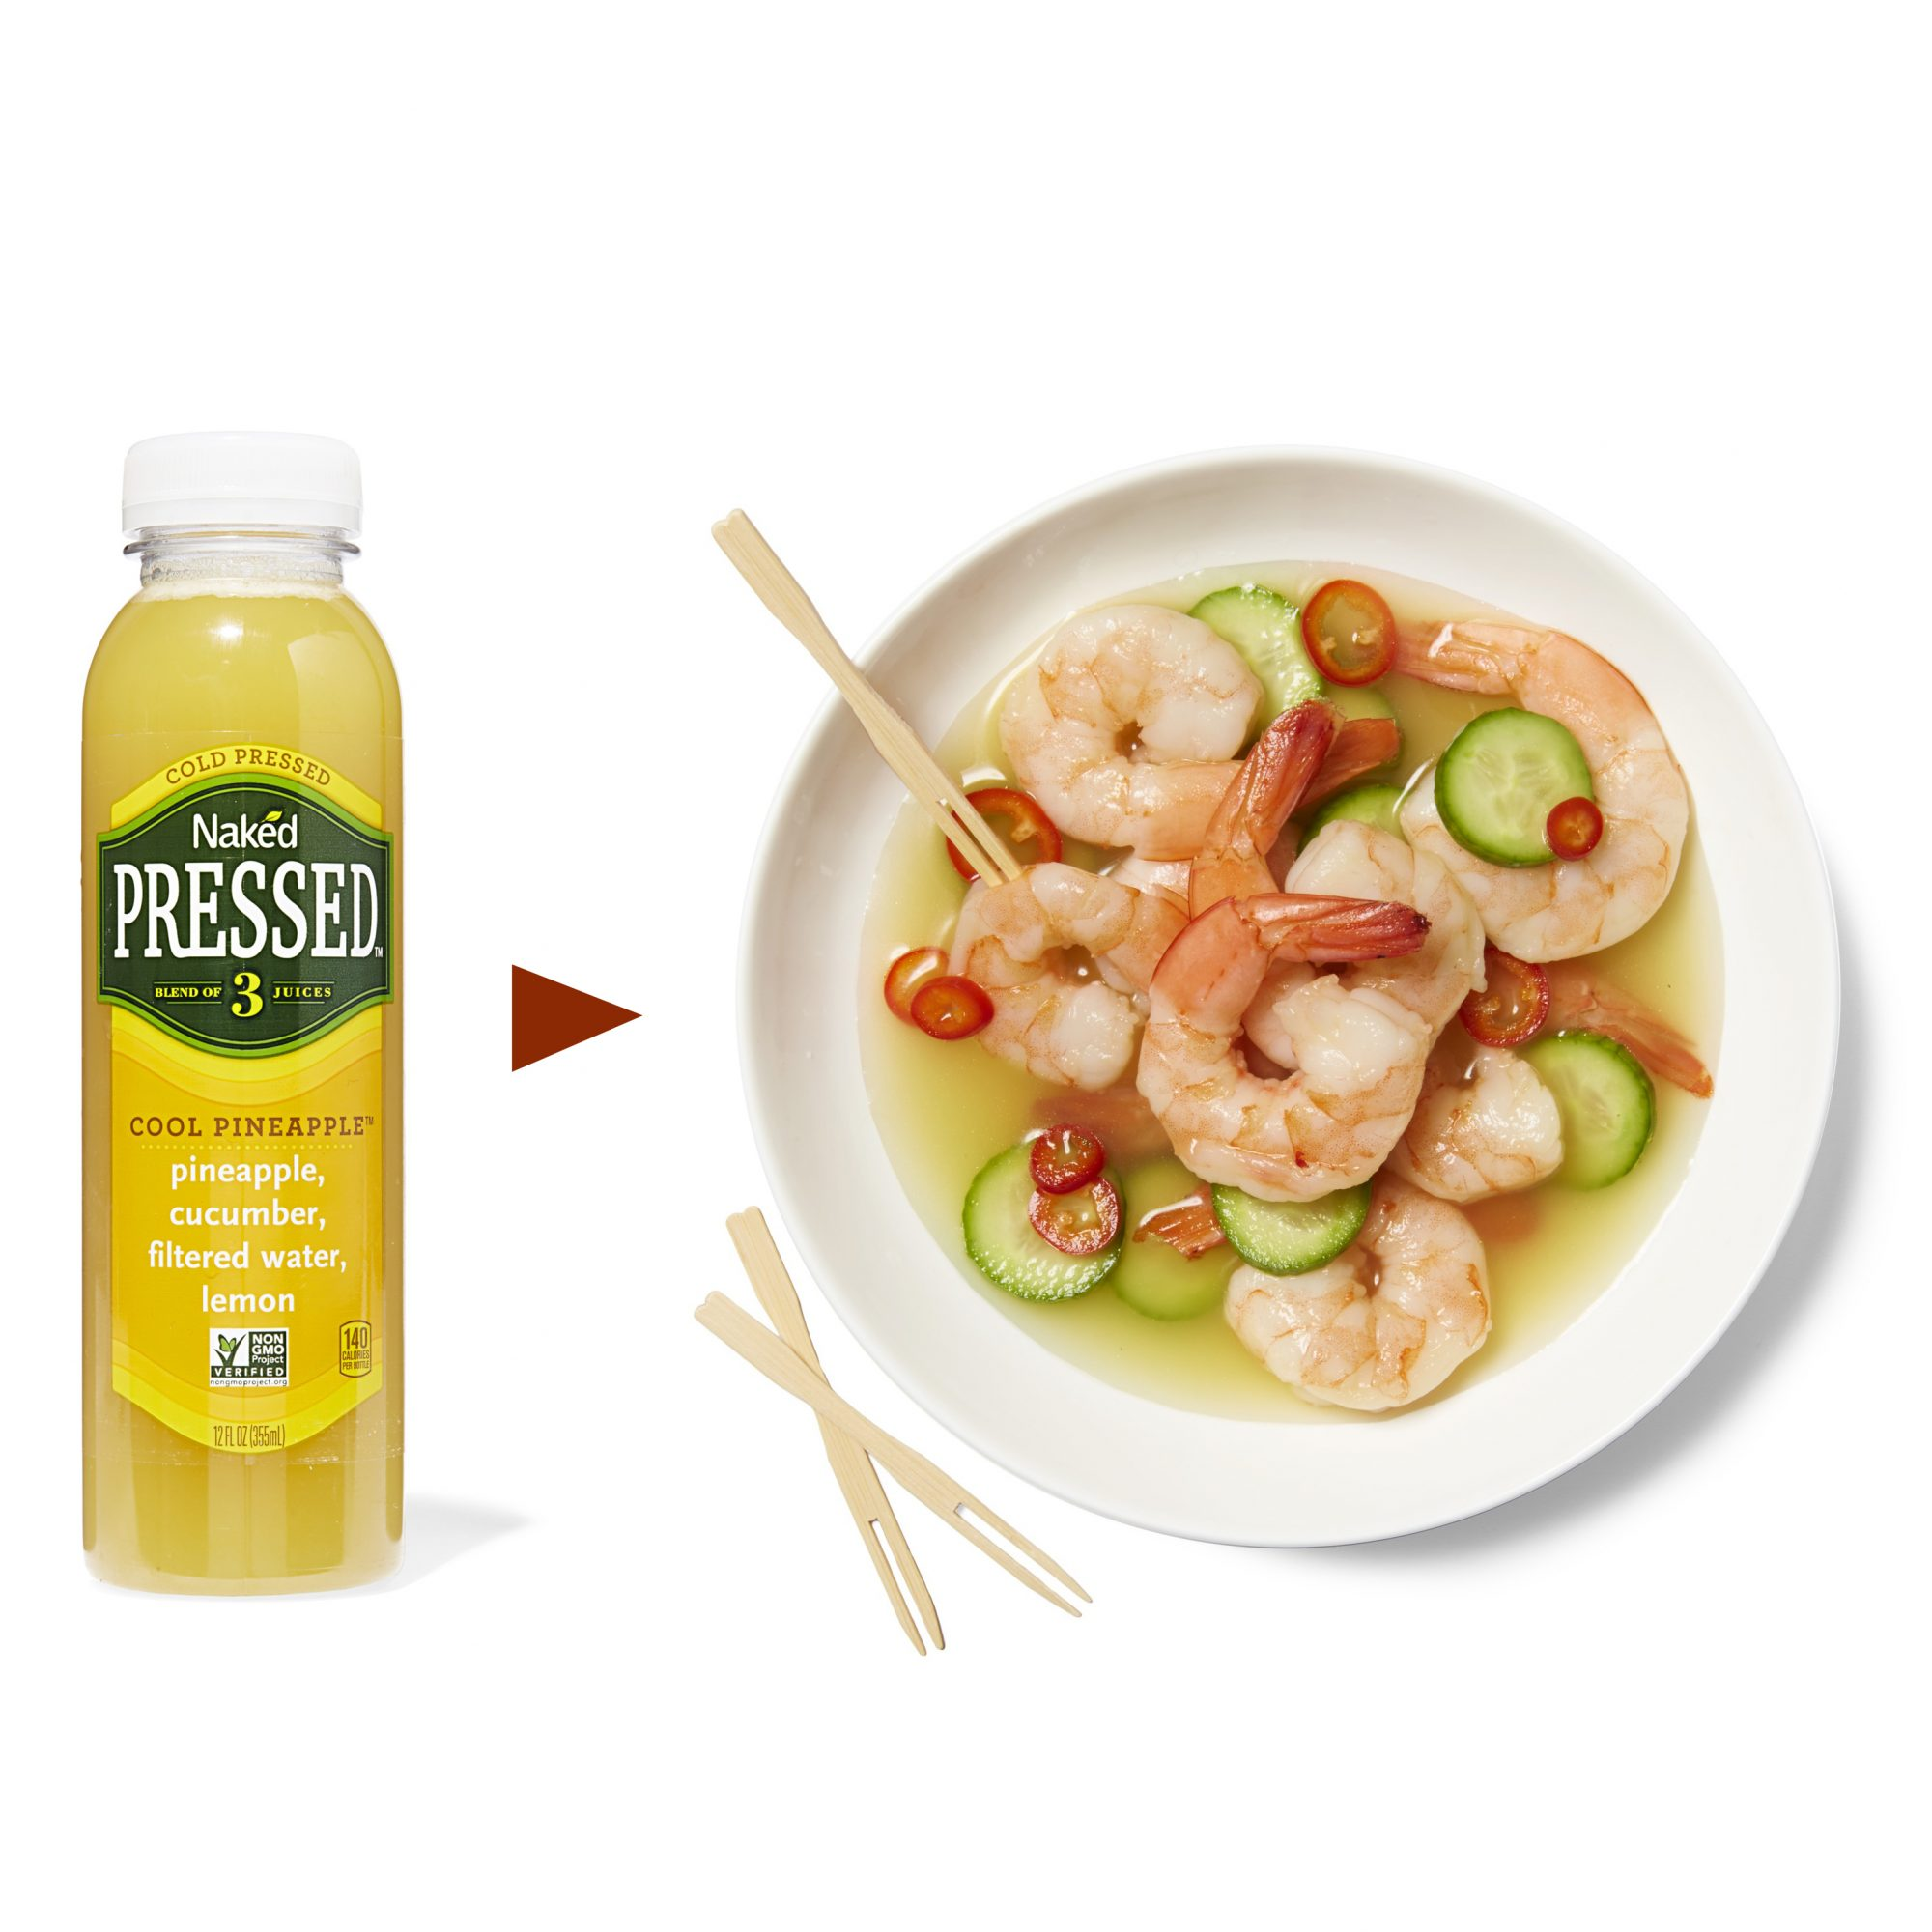 spicy pineapple marinated shrimp